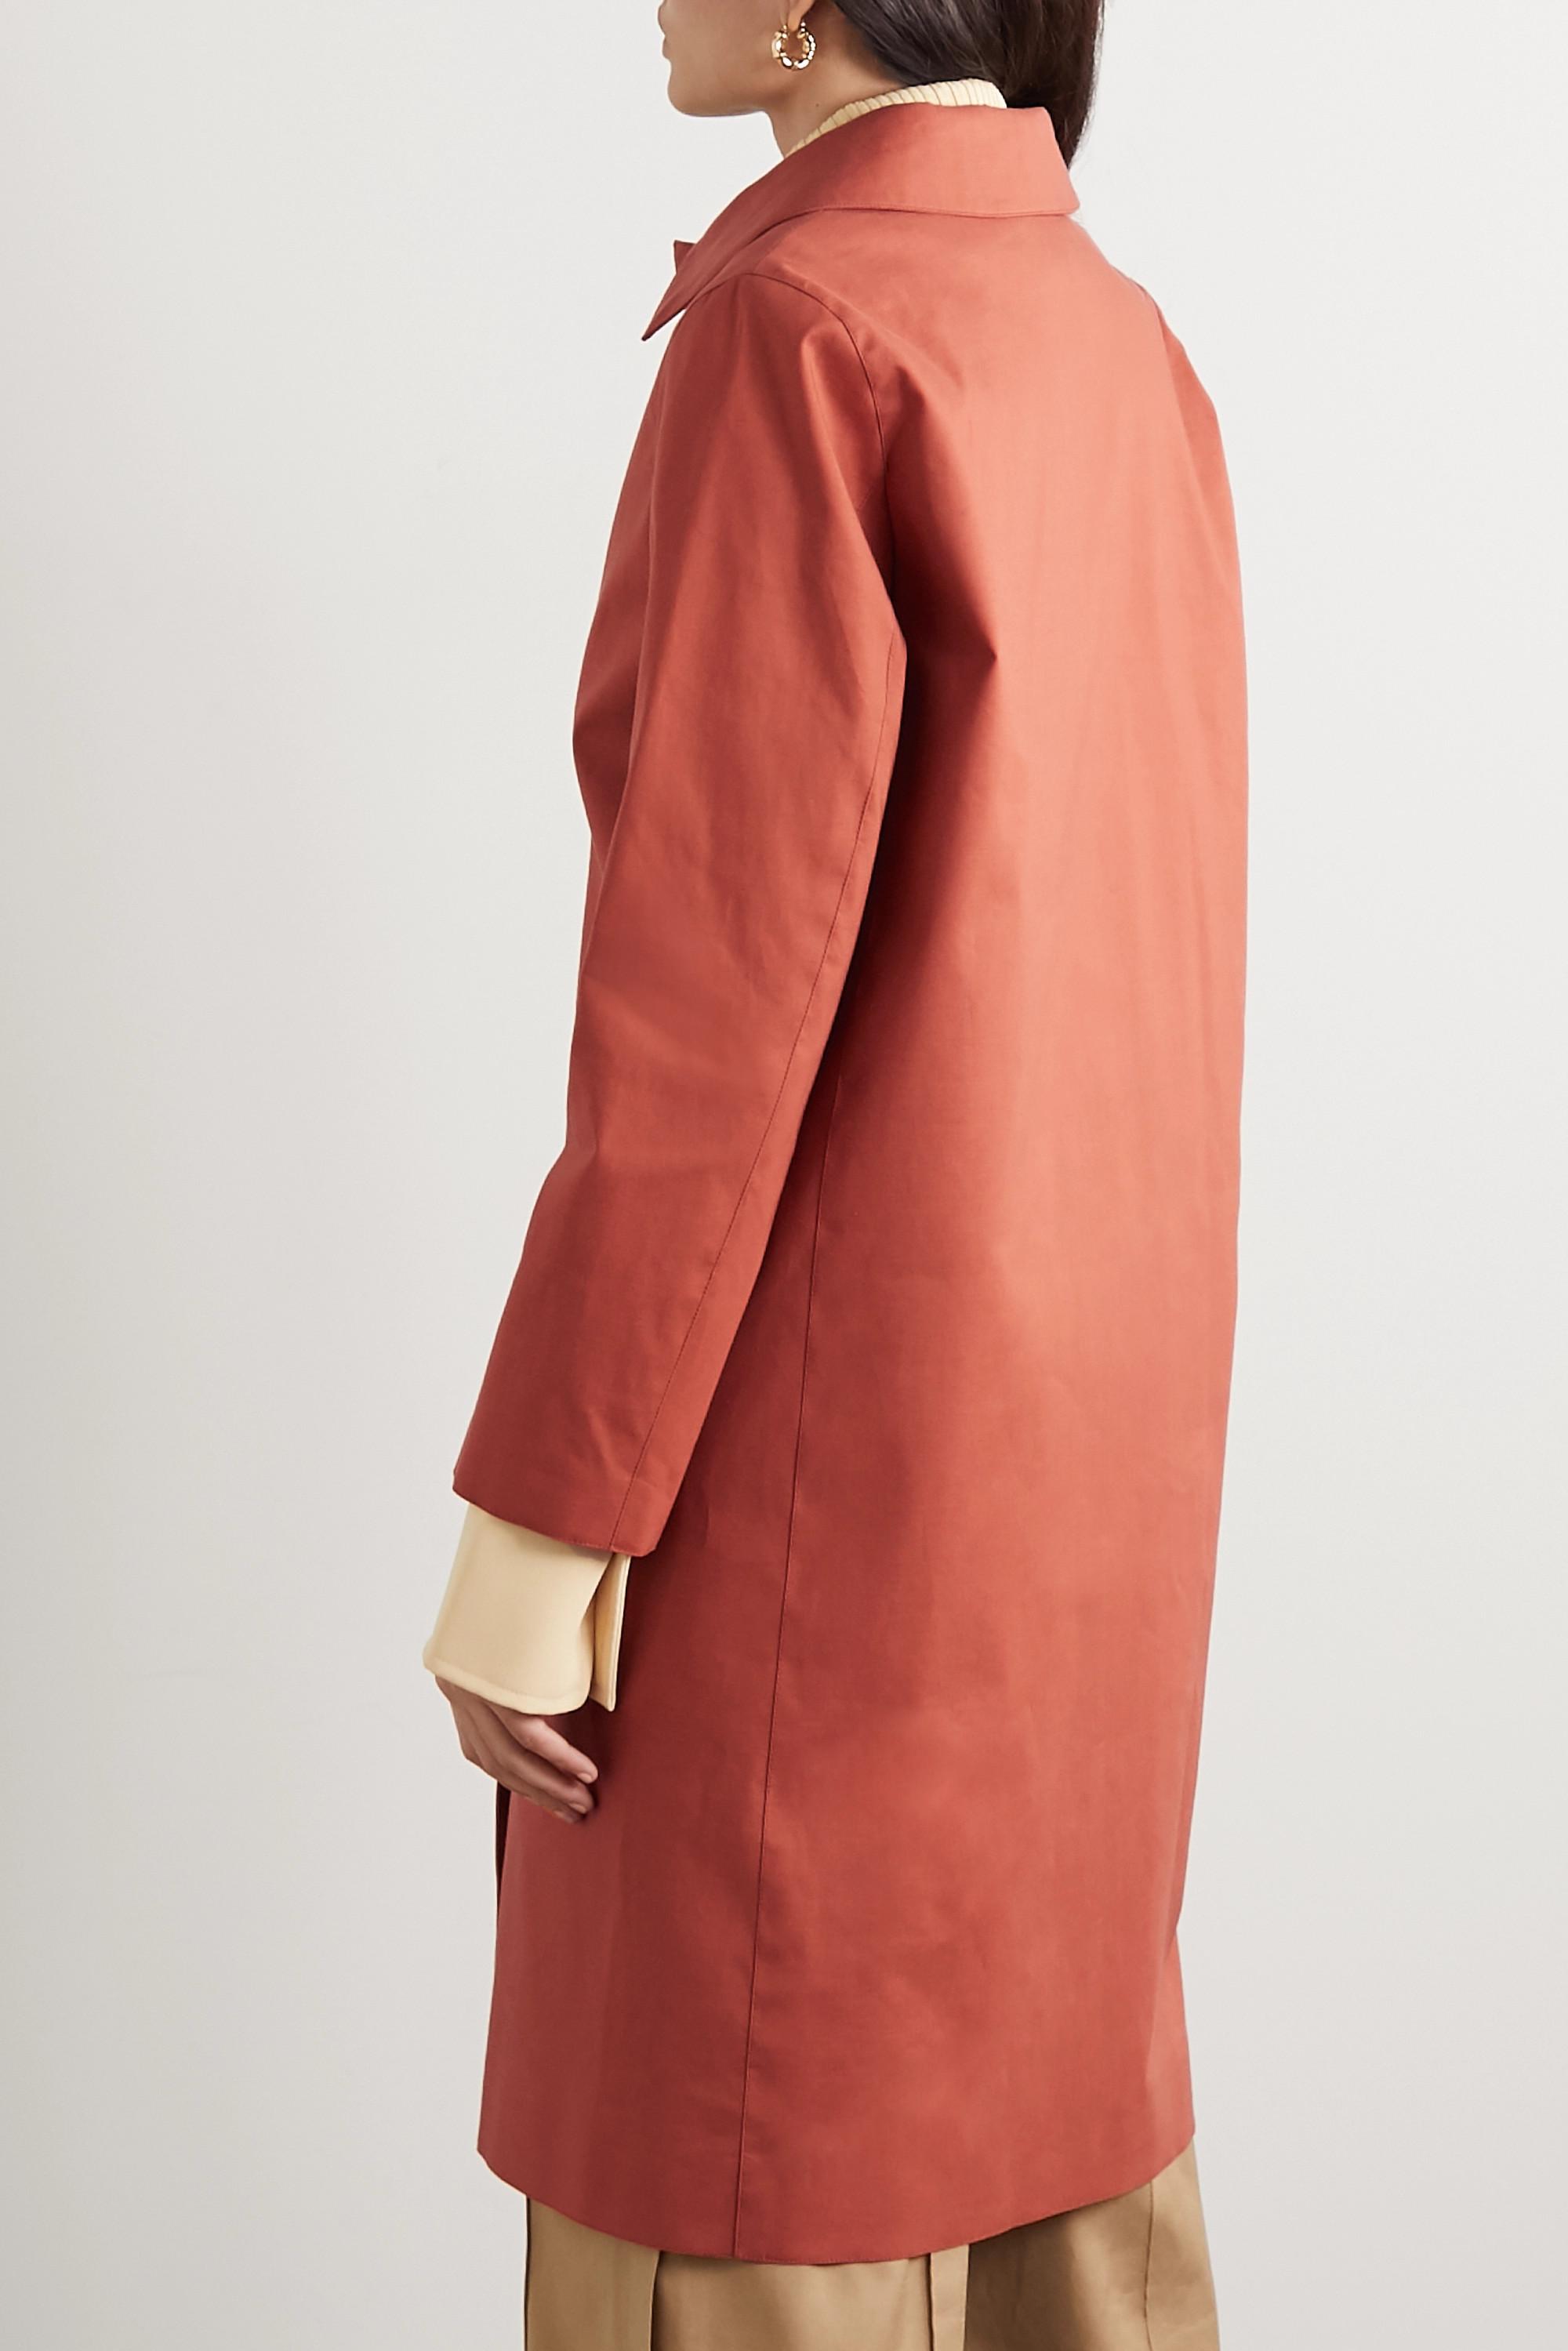 Mackintosh Dunkeld bonded cotton coat